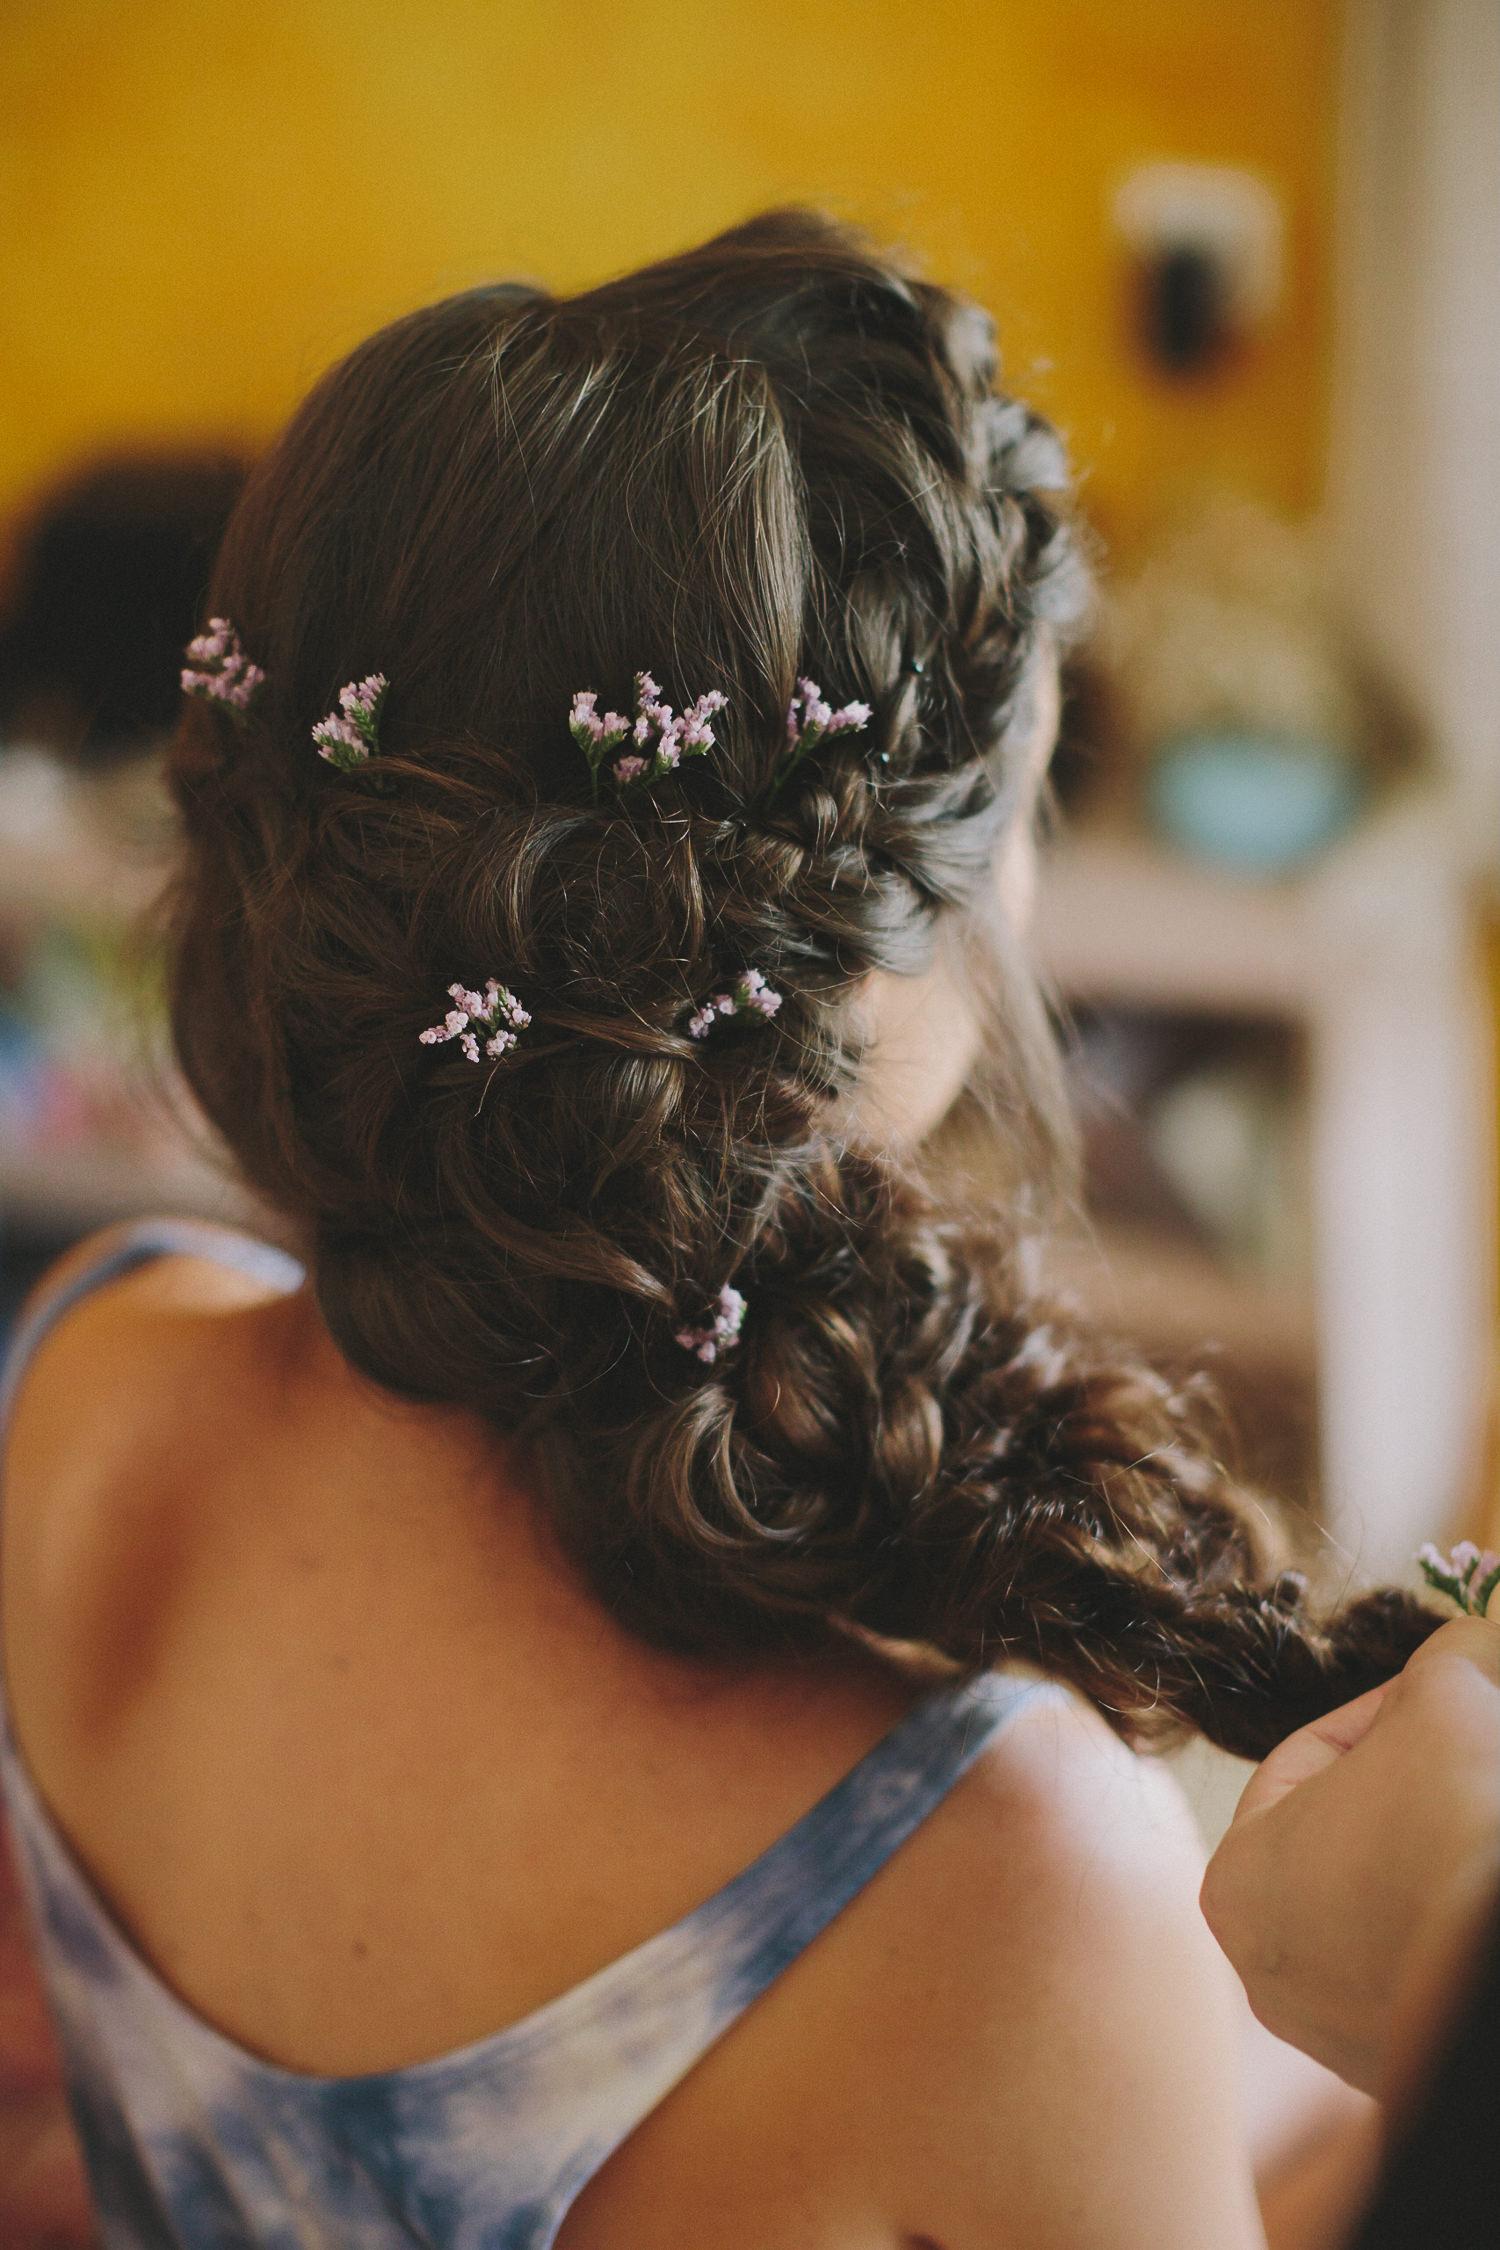 Countryside Wedding - Liron Erel - Echoes & Wildhearts 0004.jpg